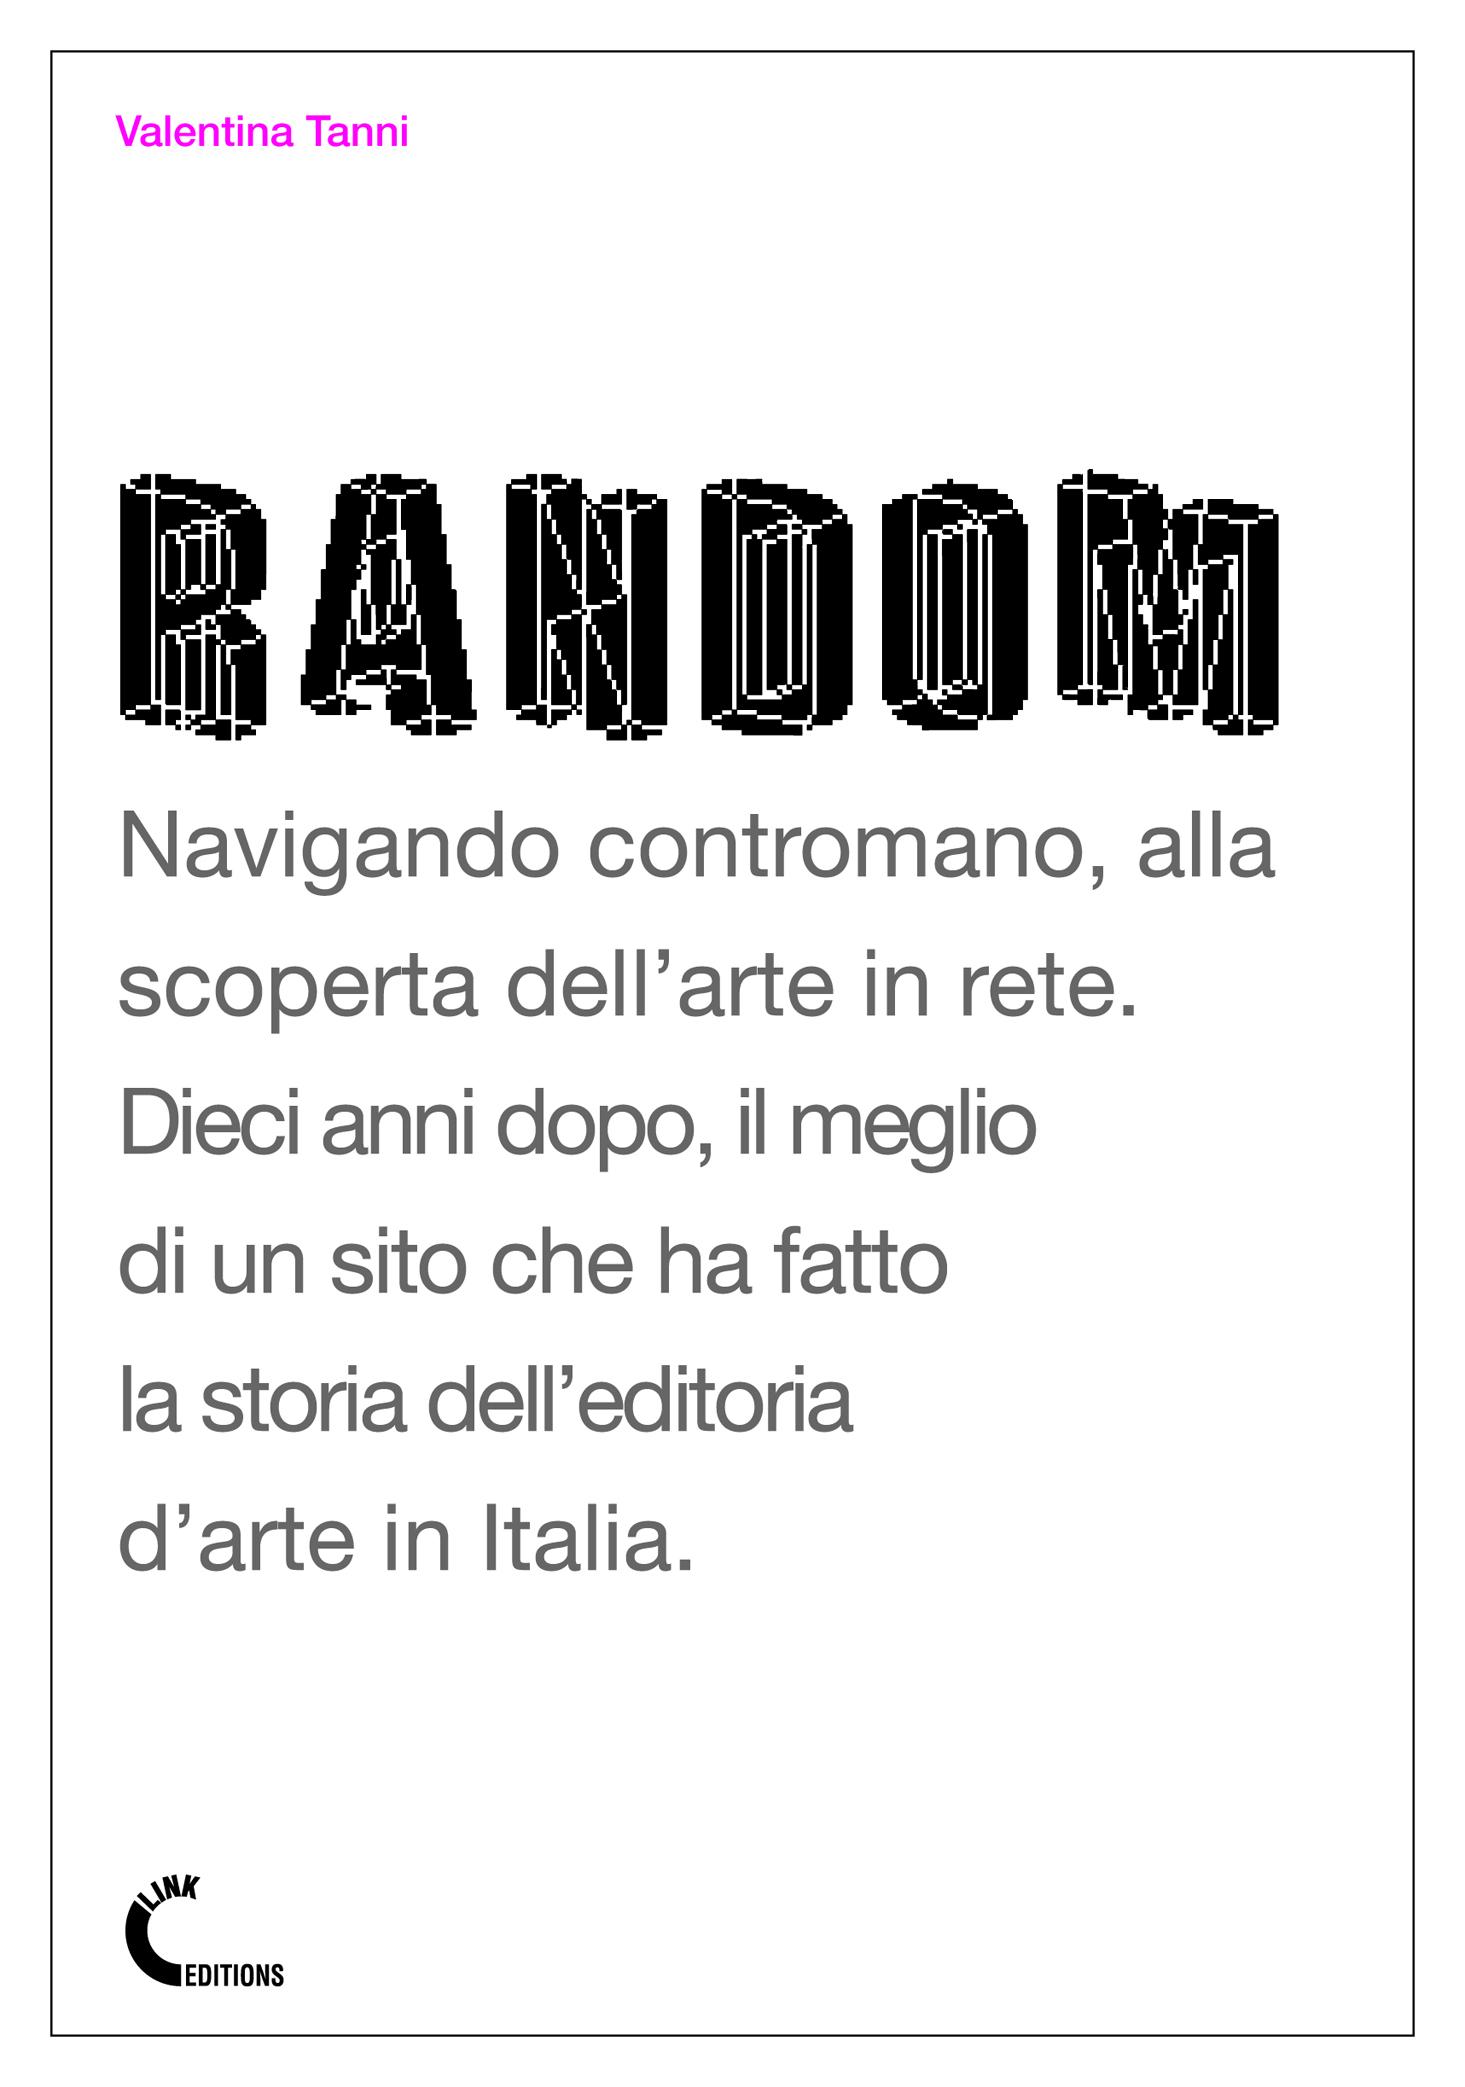 Random. The boo